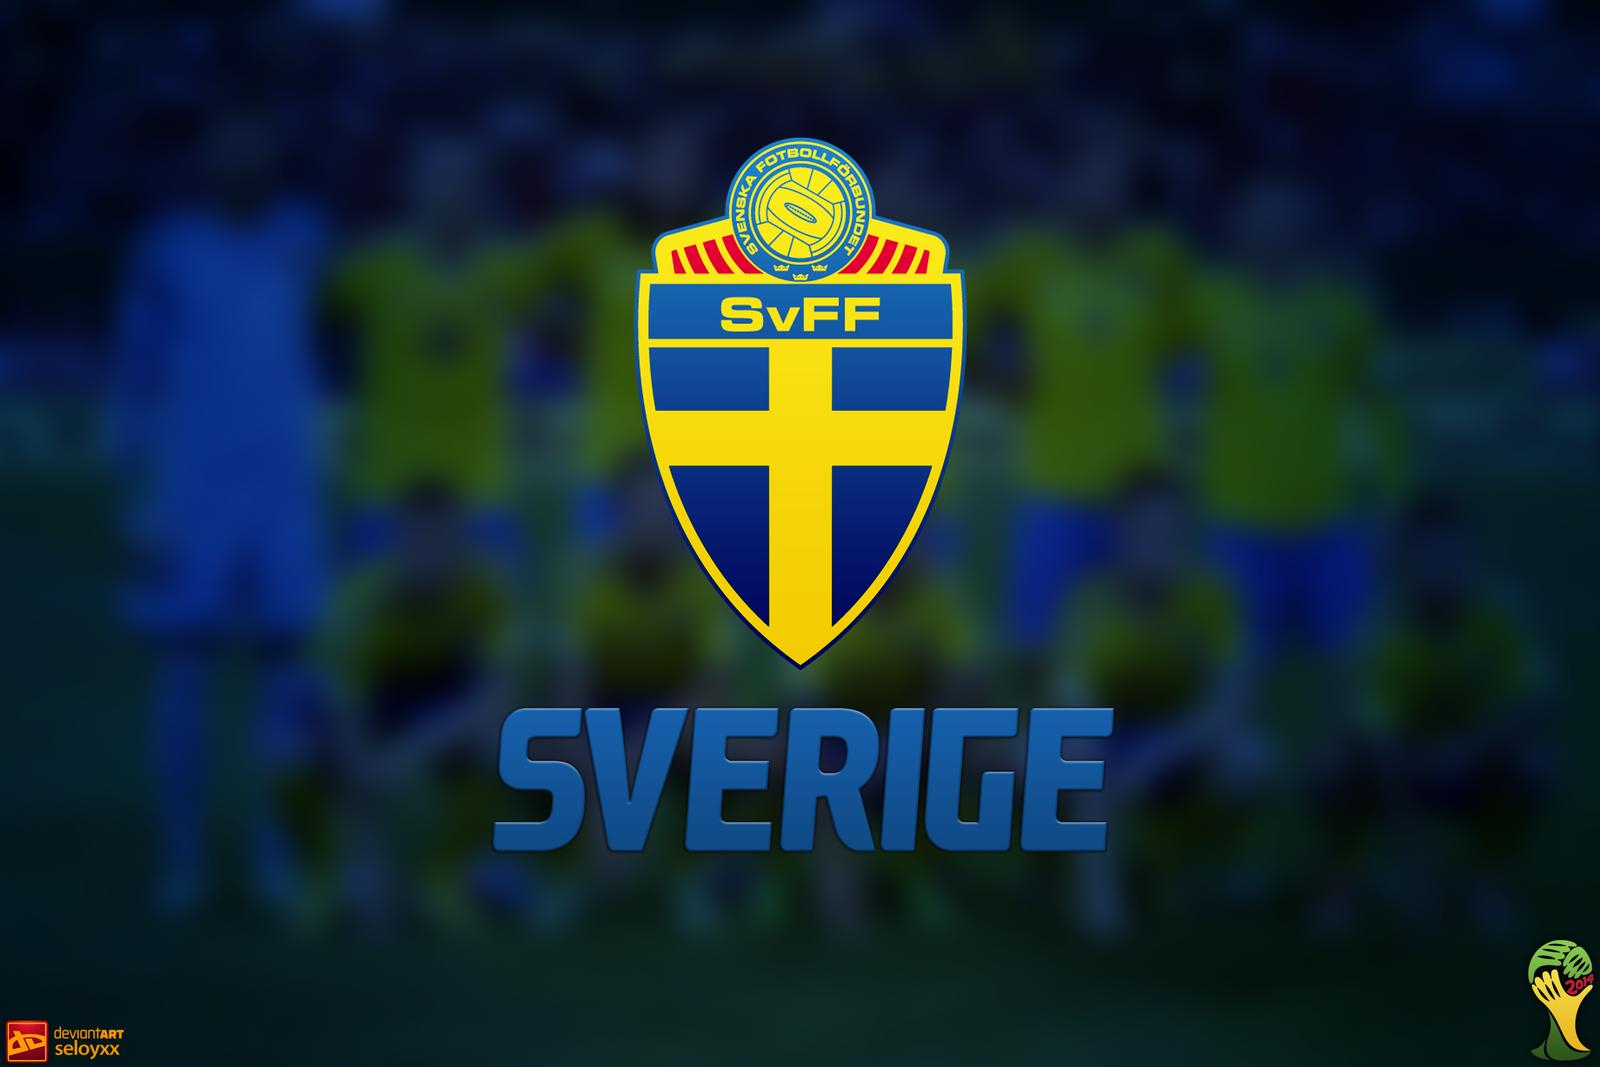 Night Wallpaper No Logo By Ualgreymon On Deviantart: Sweden Wallpaper By Seloyxx On DeviantArt